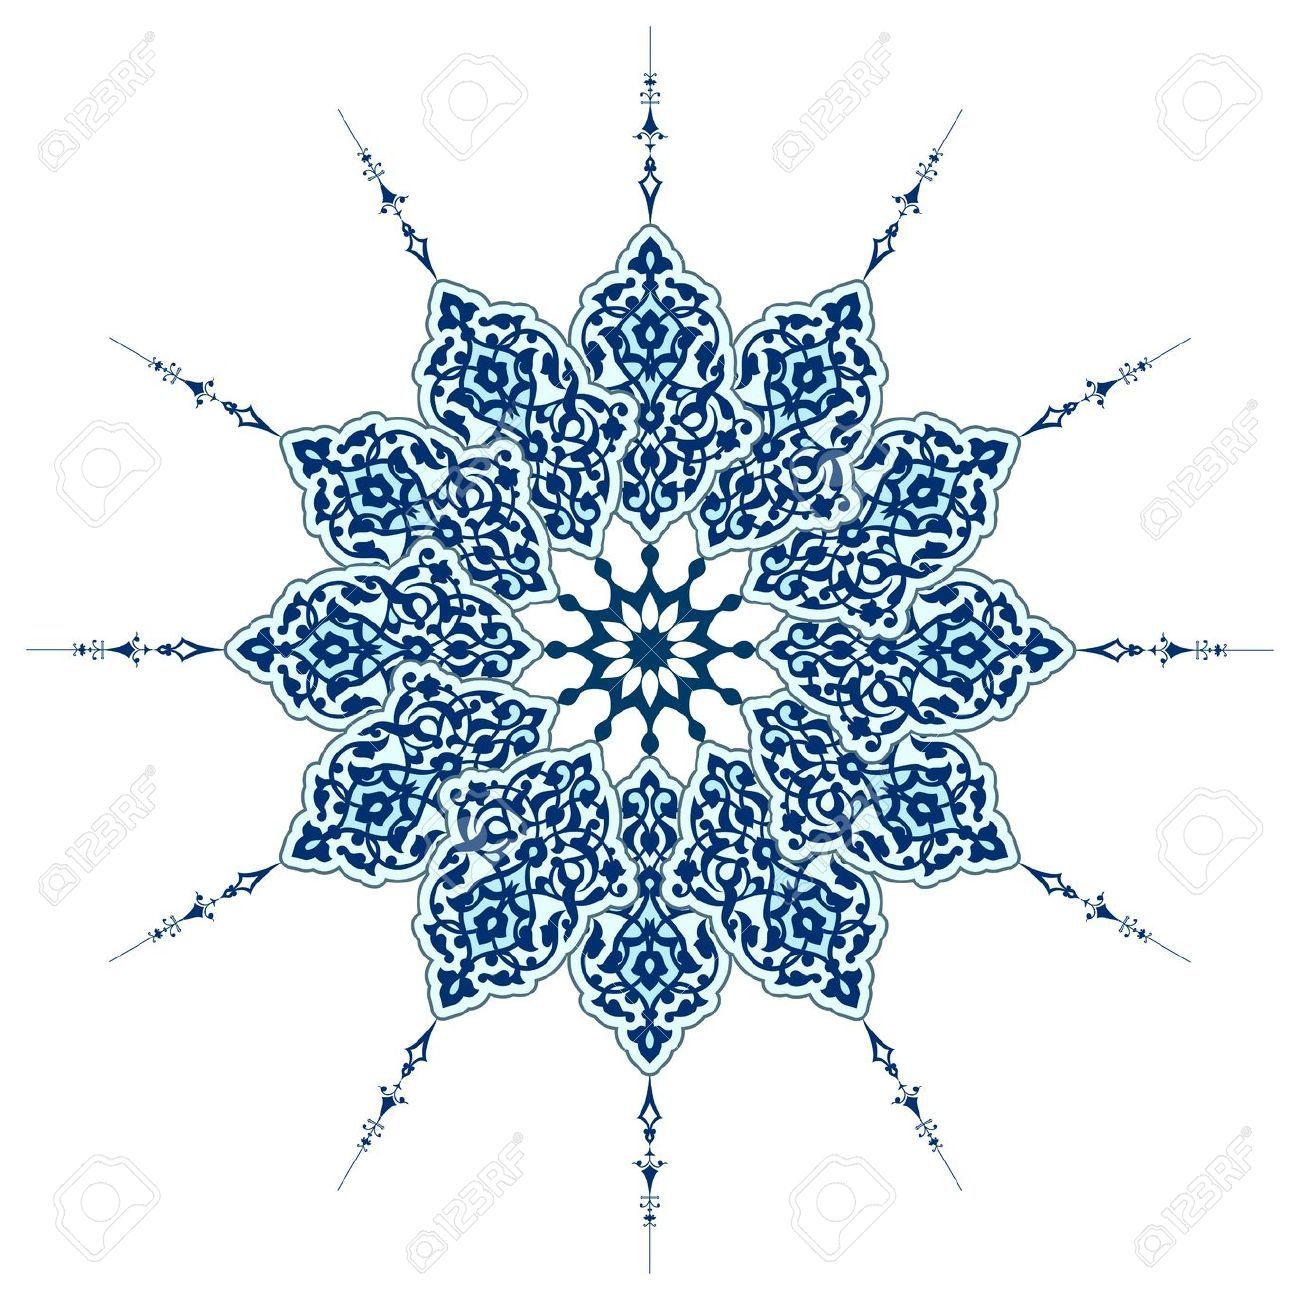 Tattoos arabesque tattoos arabeske tattoos arabesk tattoos - Vector Of Traditional Persian Arabic Turkish Islamic Pattern Royalty Free Cliparts Vectors Tattoo